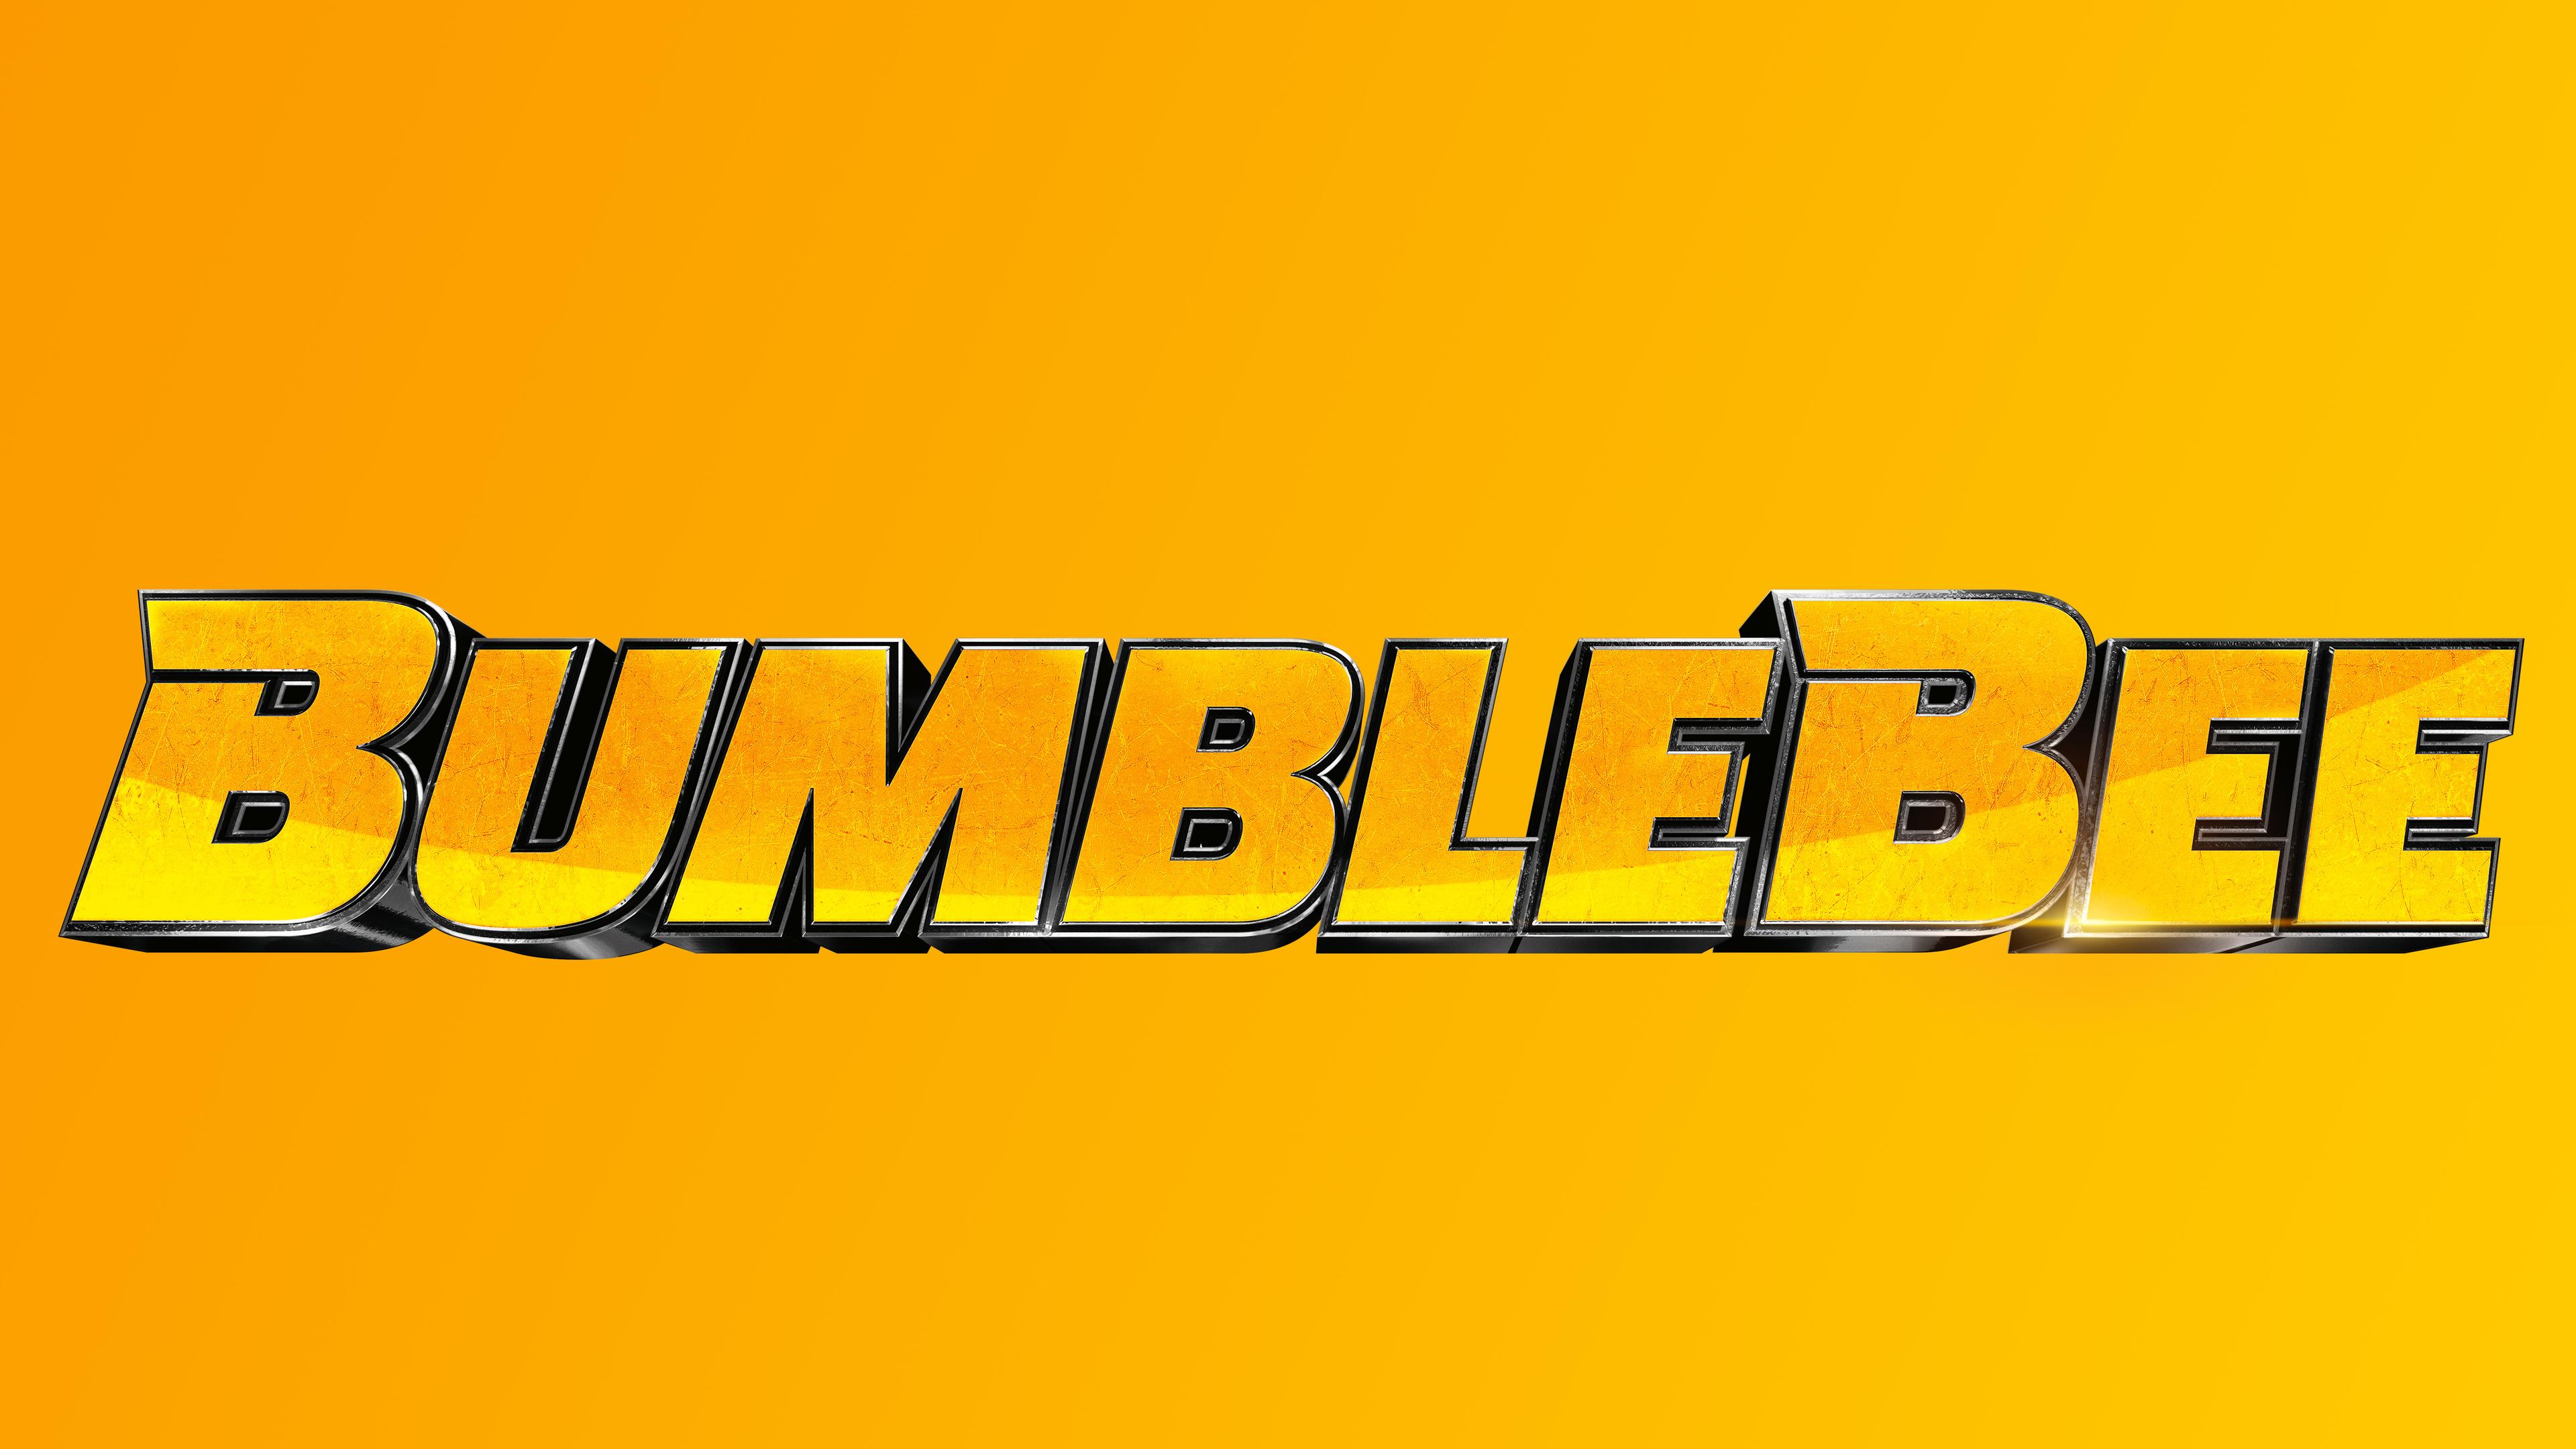 Wallpaper 4k Bumblebee Movie Logo 8k 2018 Movies Wallpapers 4k